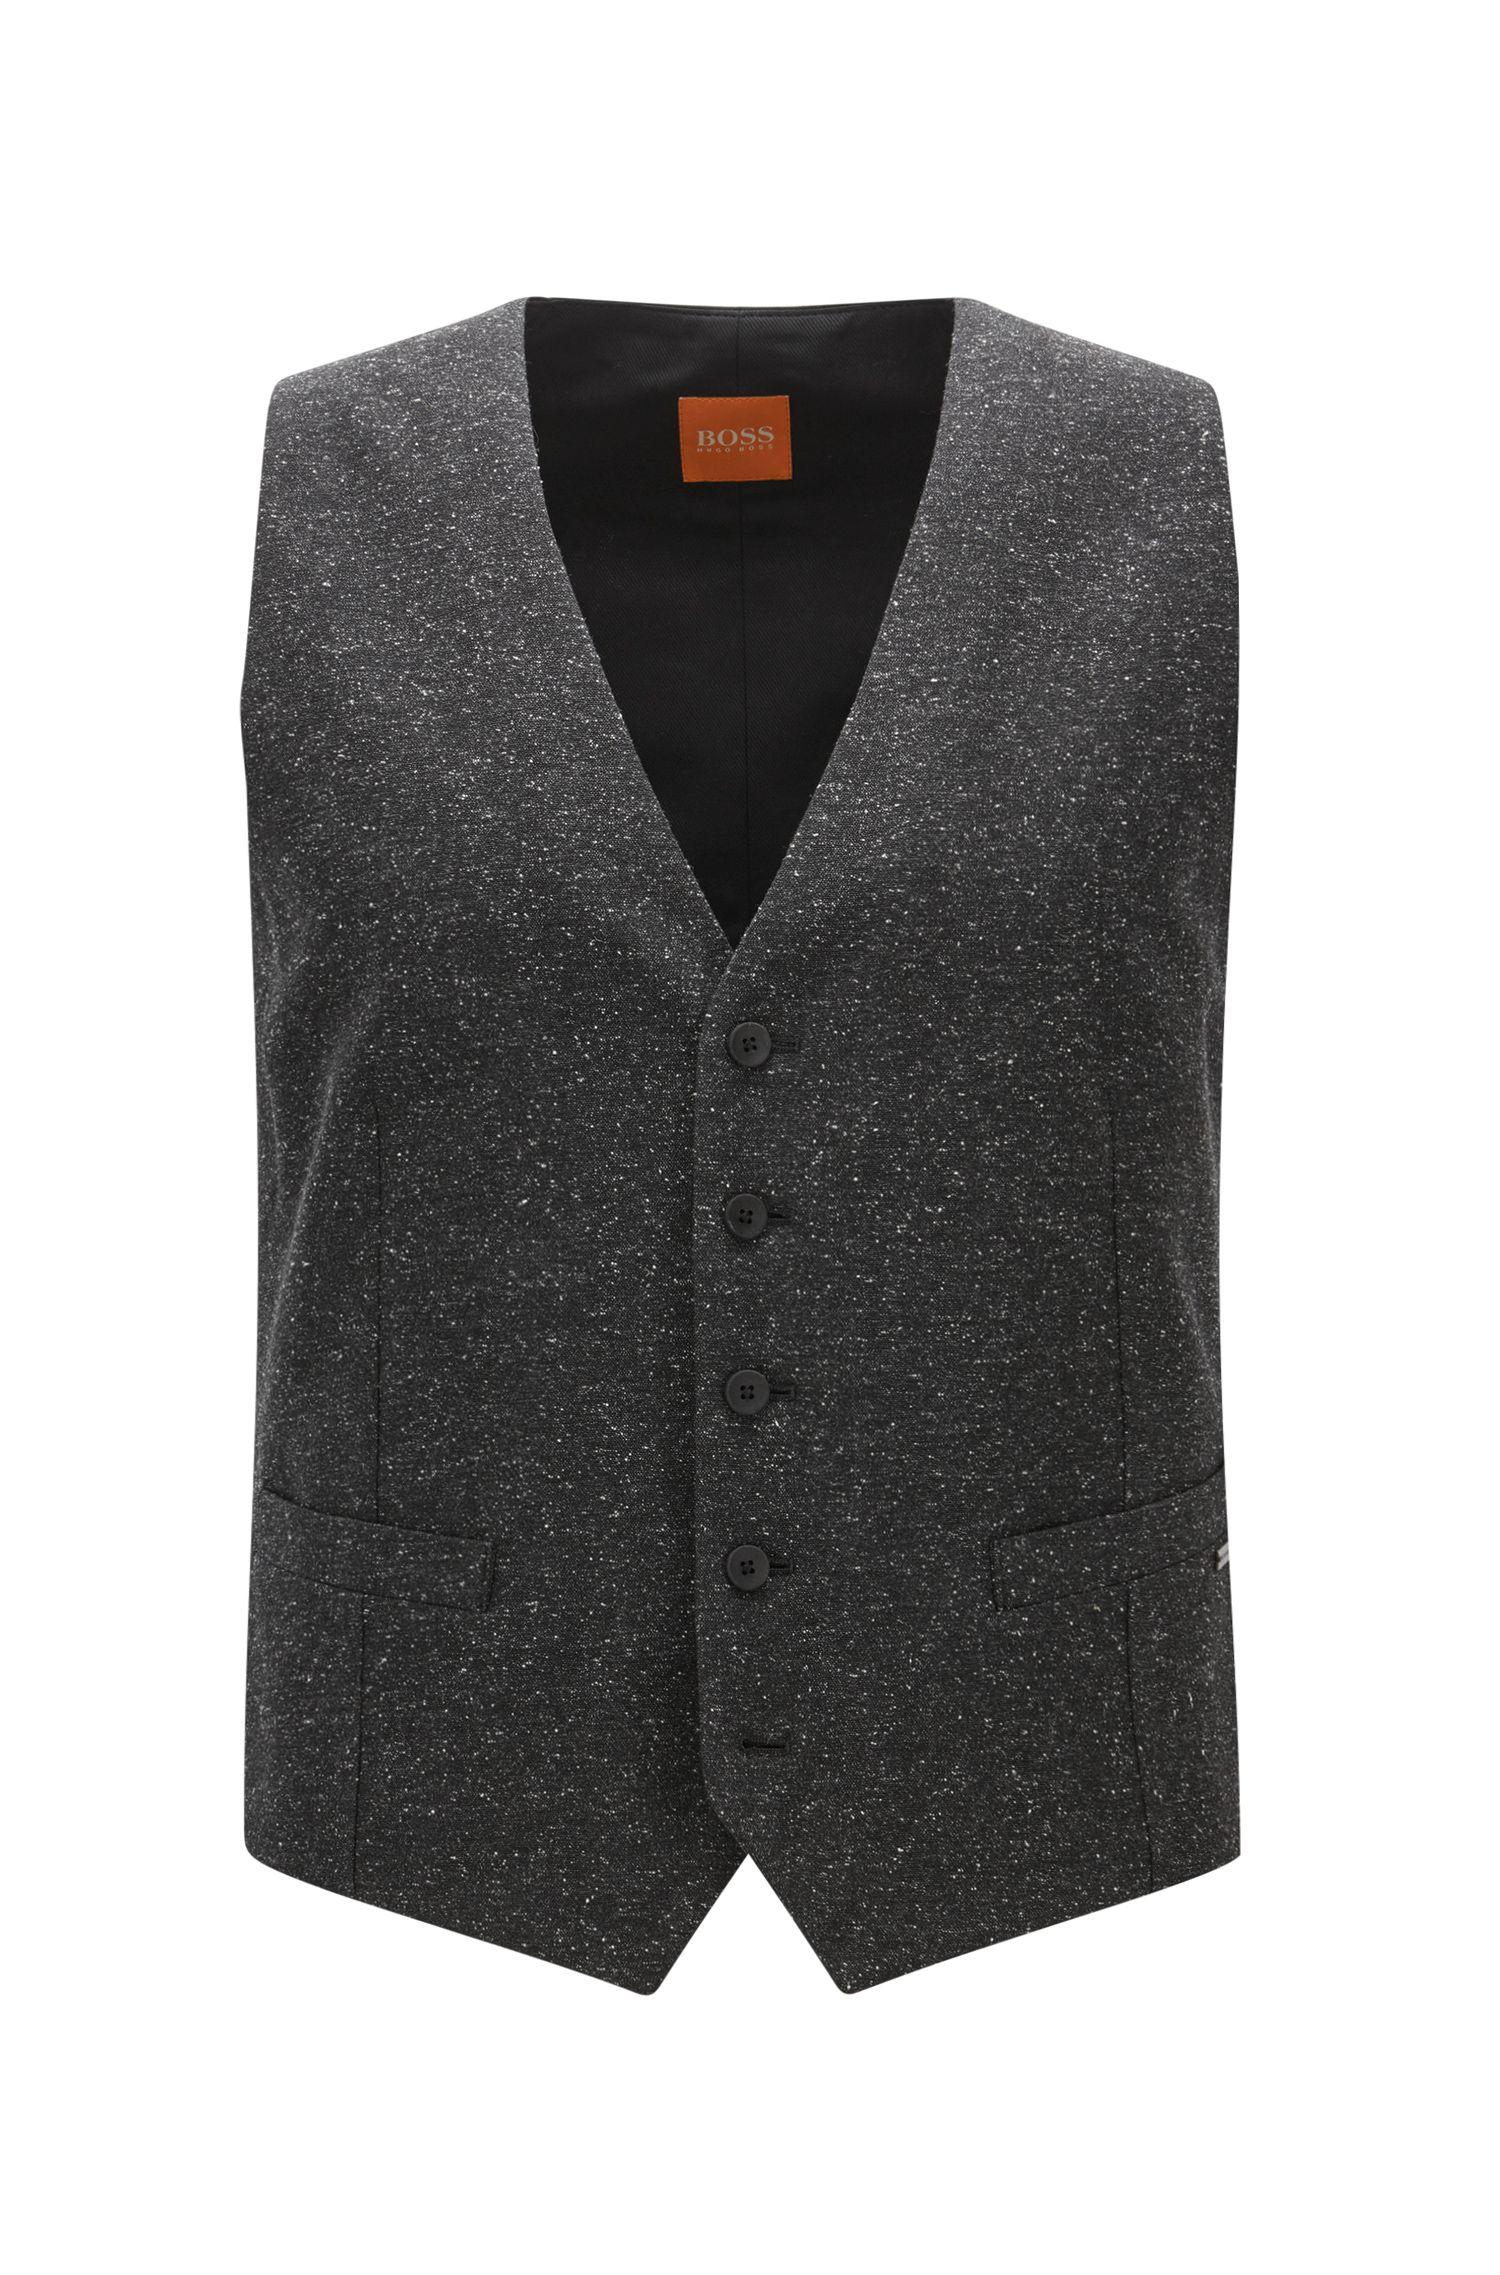 Wool Blend Waistcoat, Slim Fit | Bacer